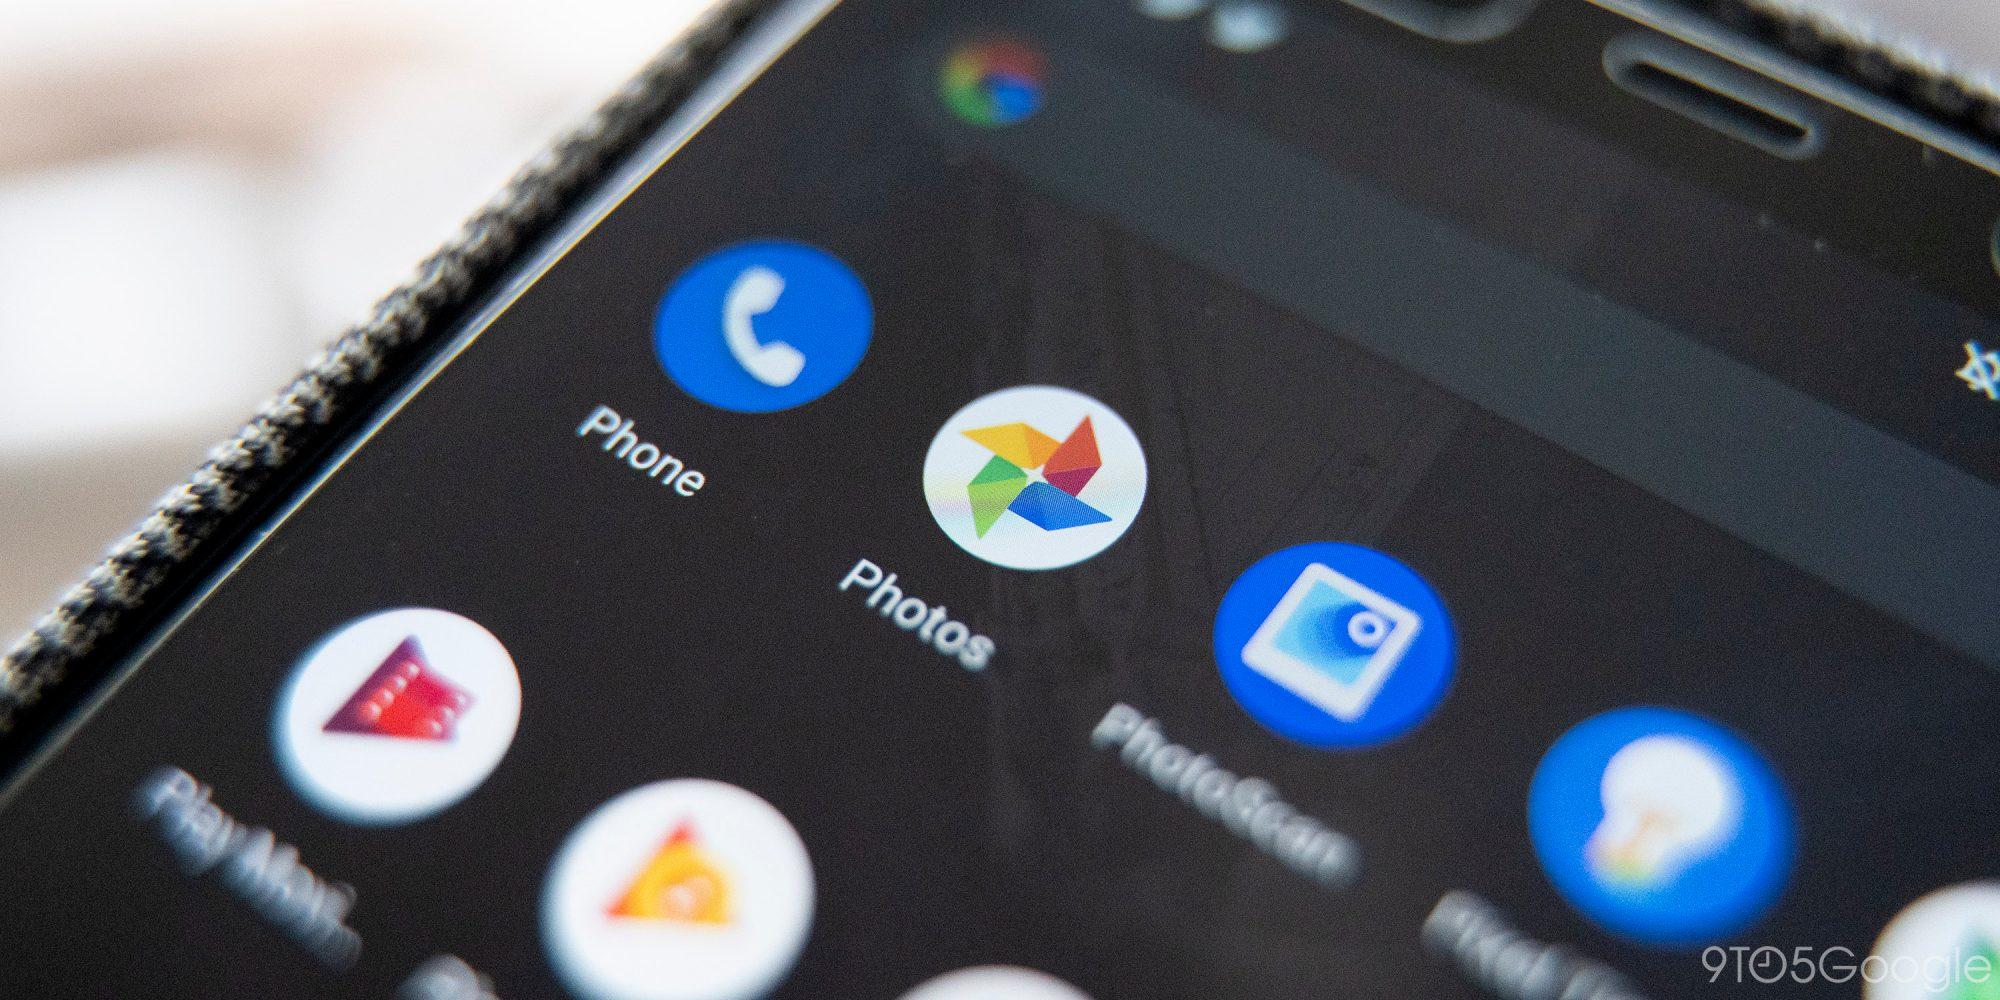 Google Photos shut down